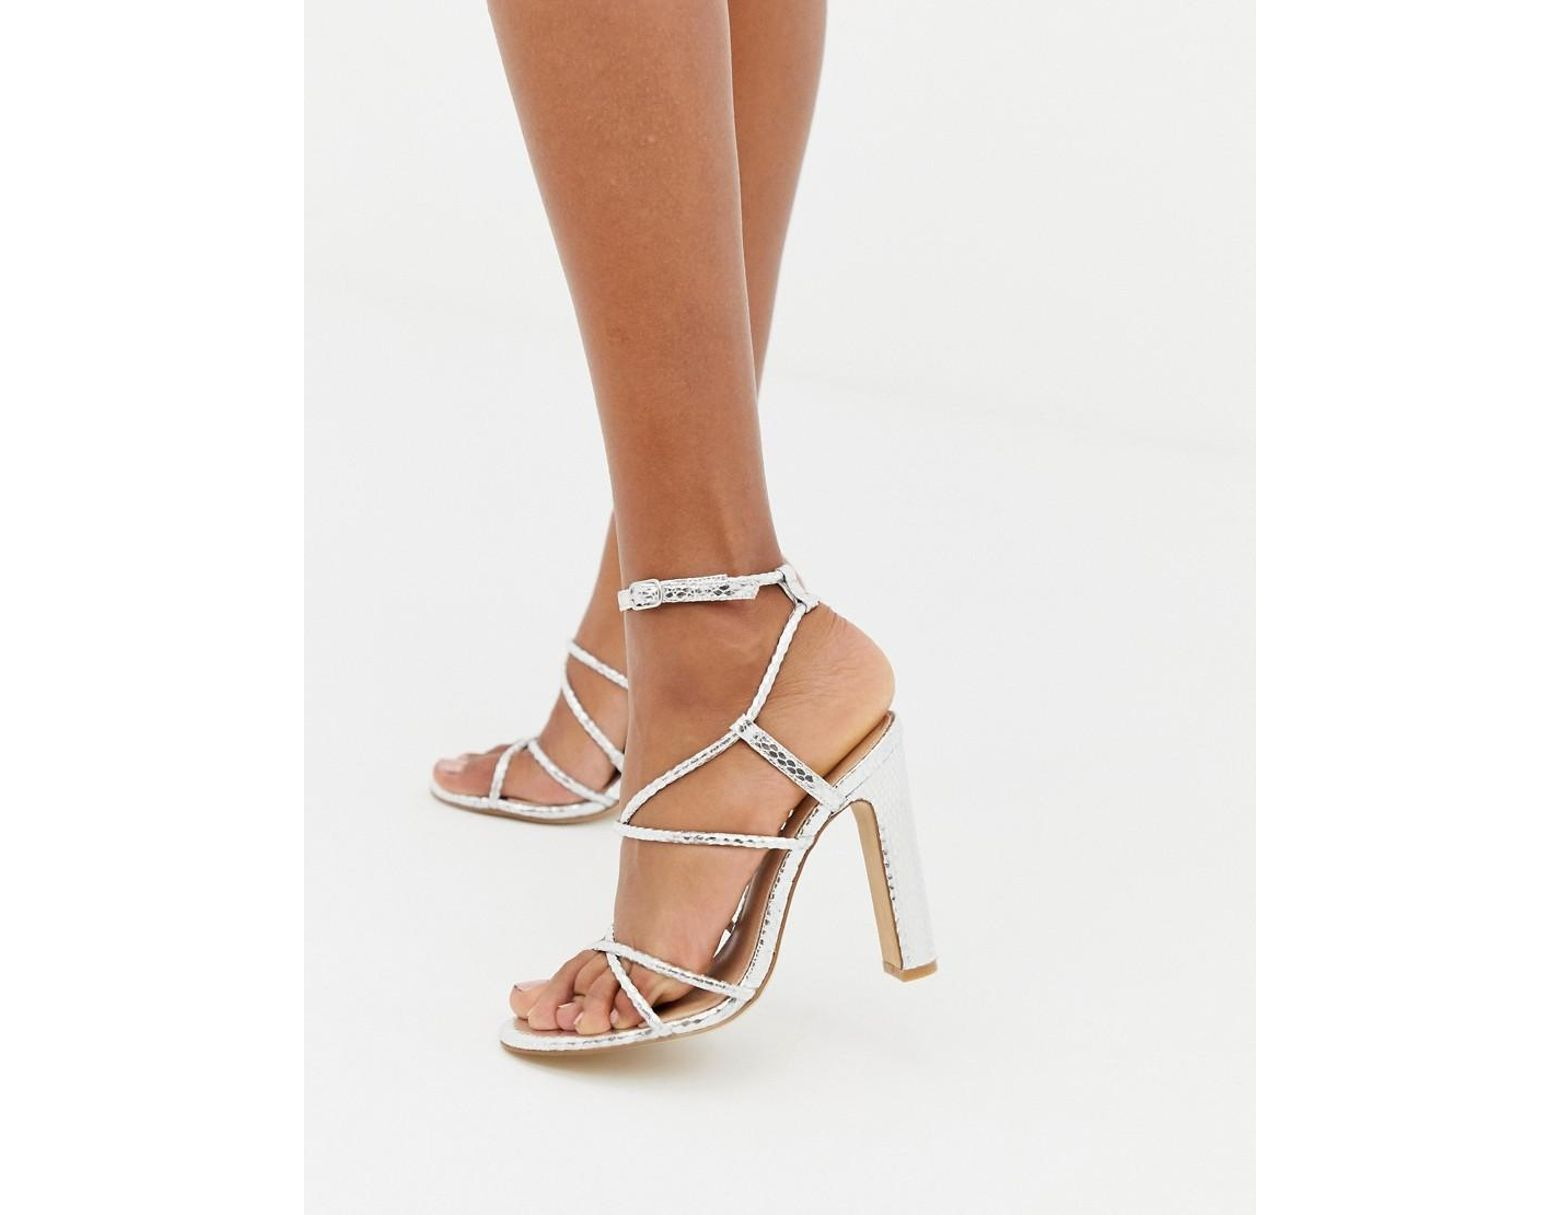 260280f6865 Women's Metallic Heaven Silver Snake Strappy Heeled Sandals